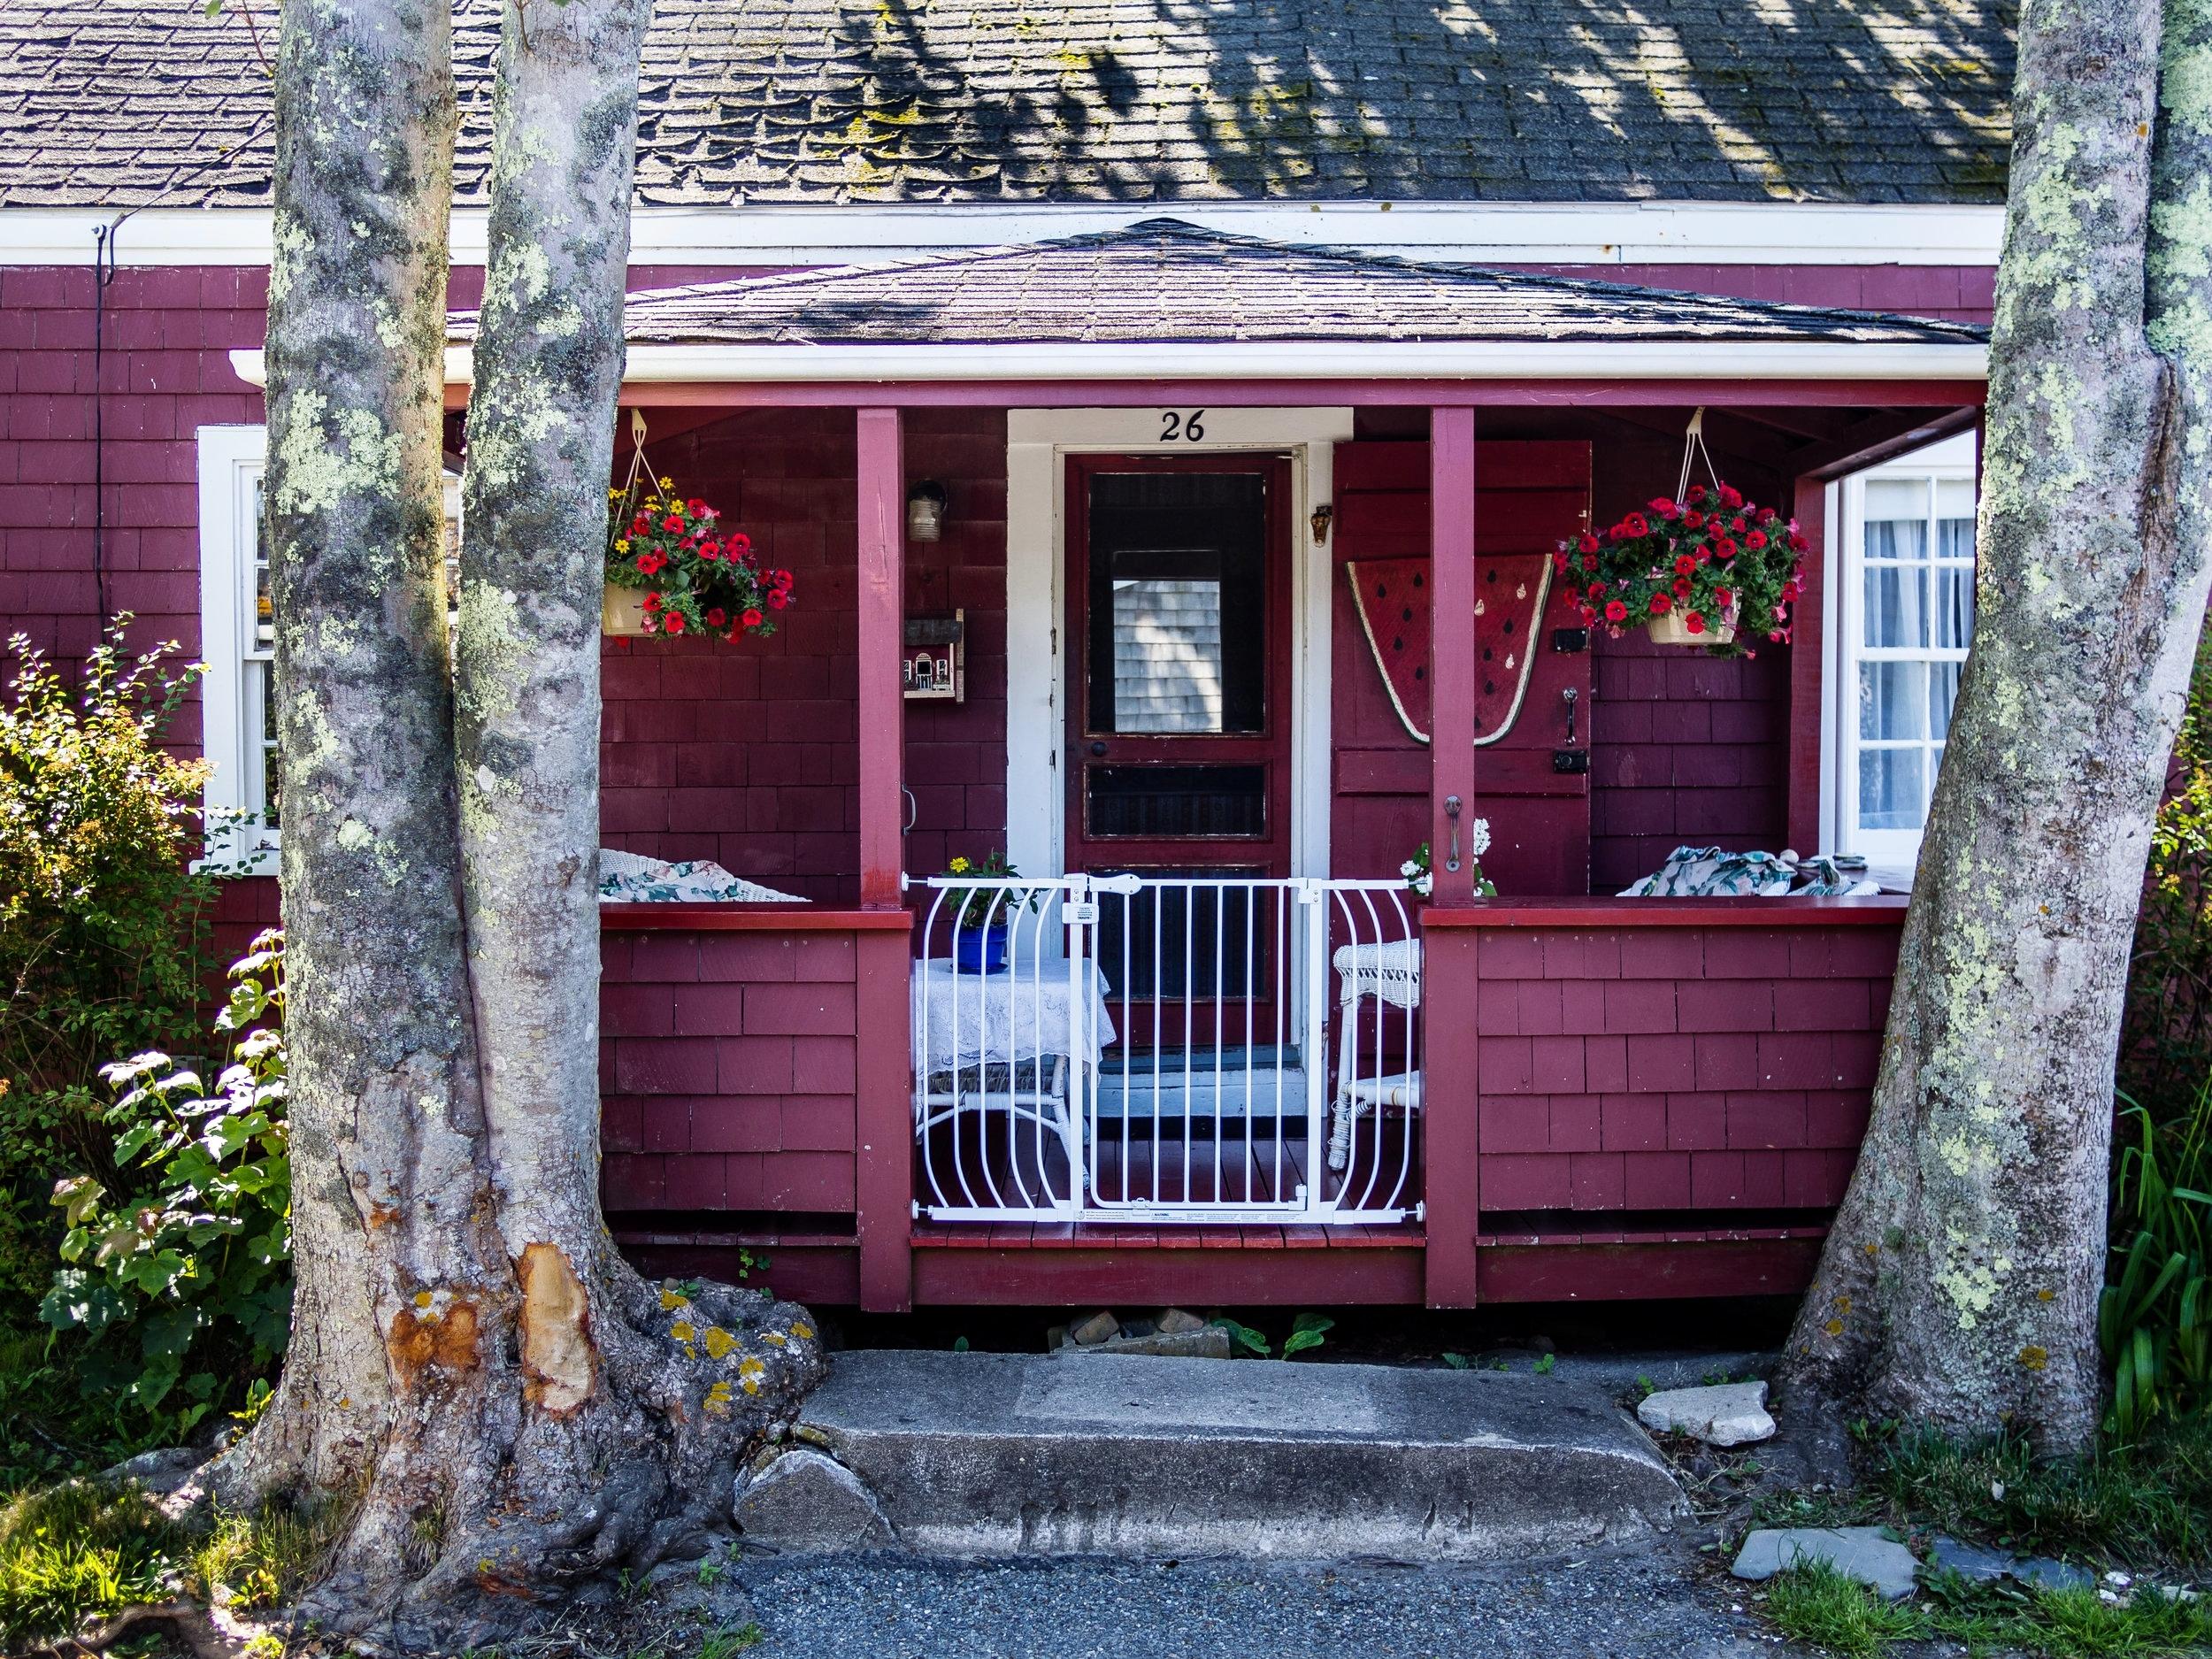 Sconset, Nantucket, 2017